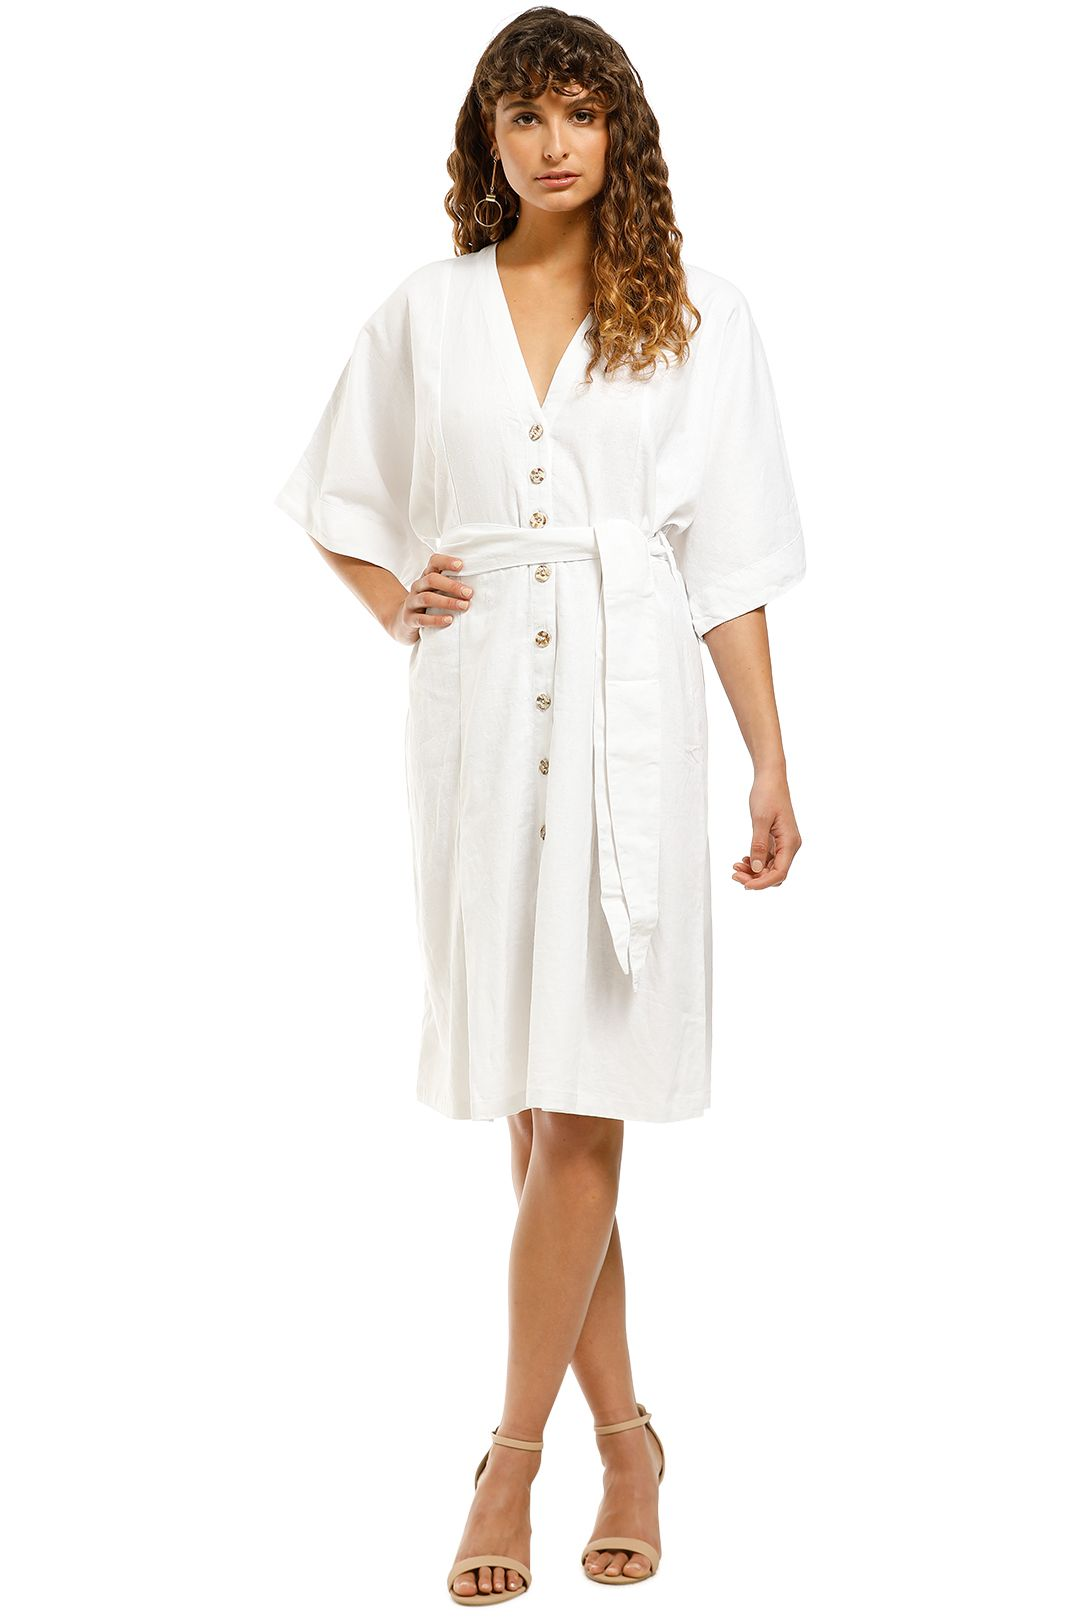 Rue-Stiic-Maverick-Midi-Dress-White-Front